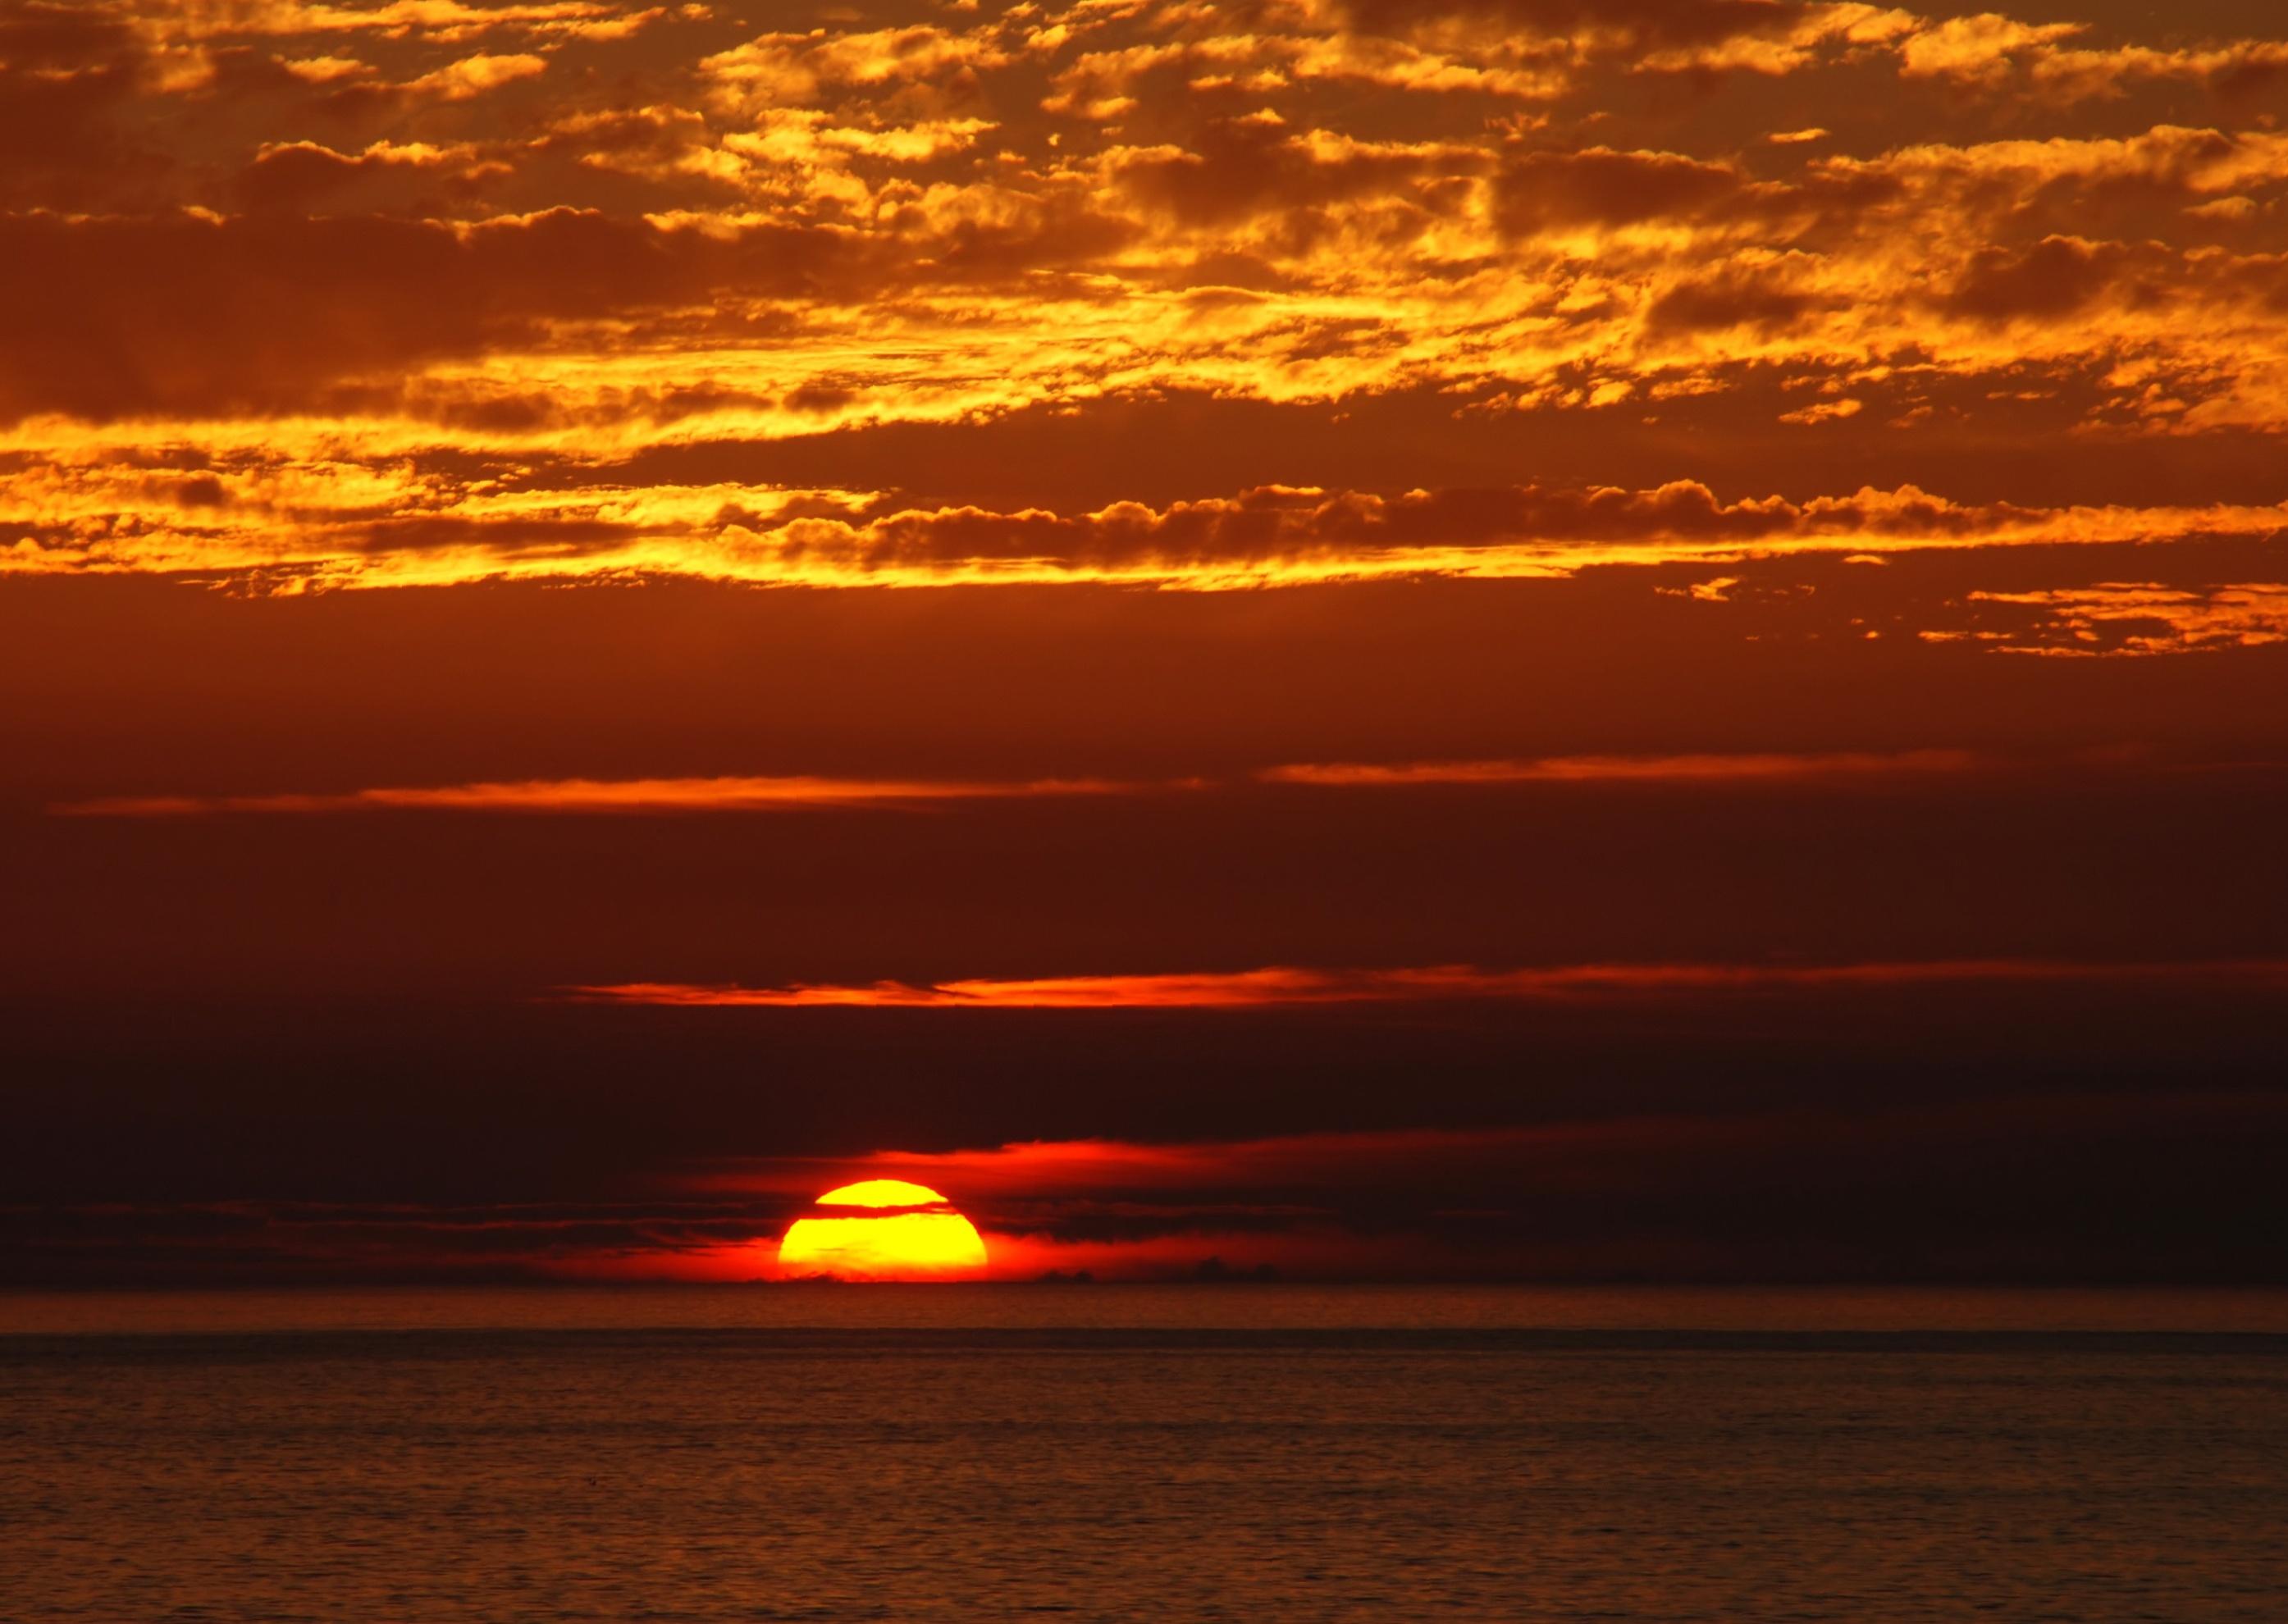 https://i2.wp.com/upload.wikimedia.org/wikipedia/commons/5/58/Sunset_2007-1.jpg